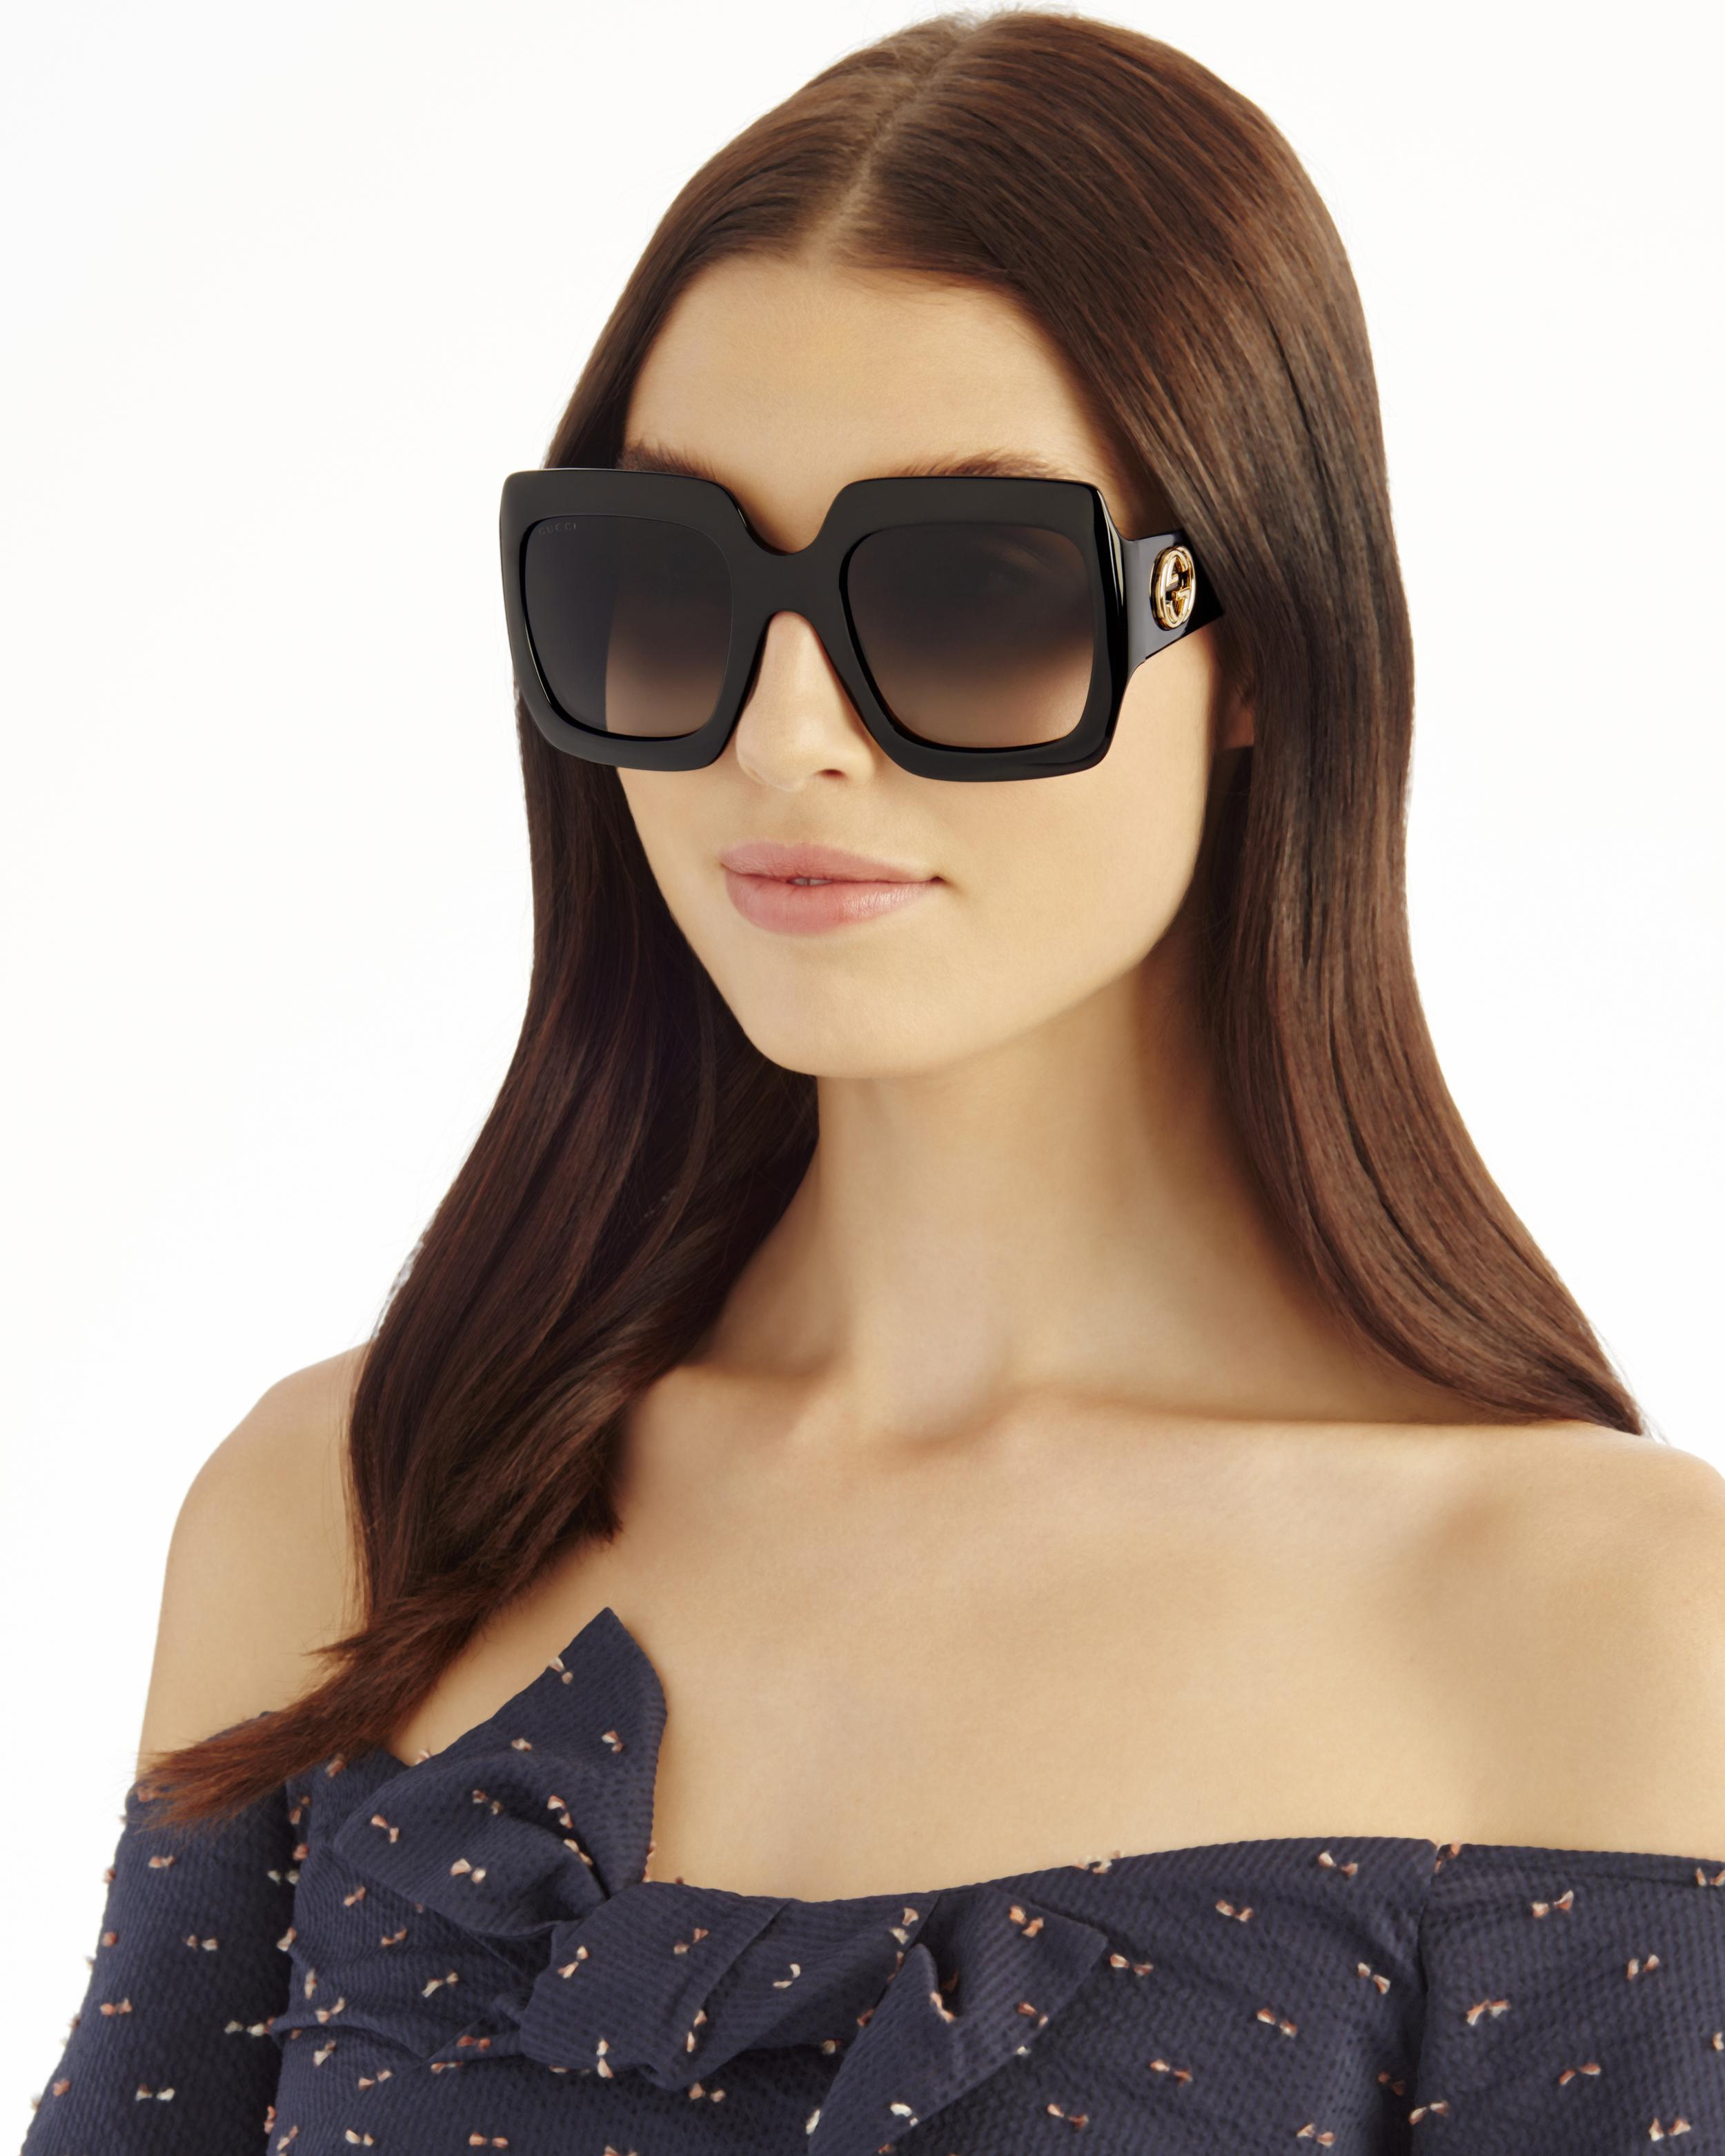 c4c0b14314 Gucci Oversized Square Sunglasses Glitter - Image Of Glasses